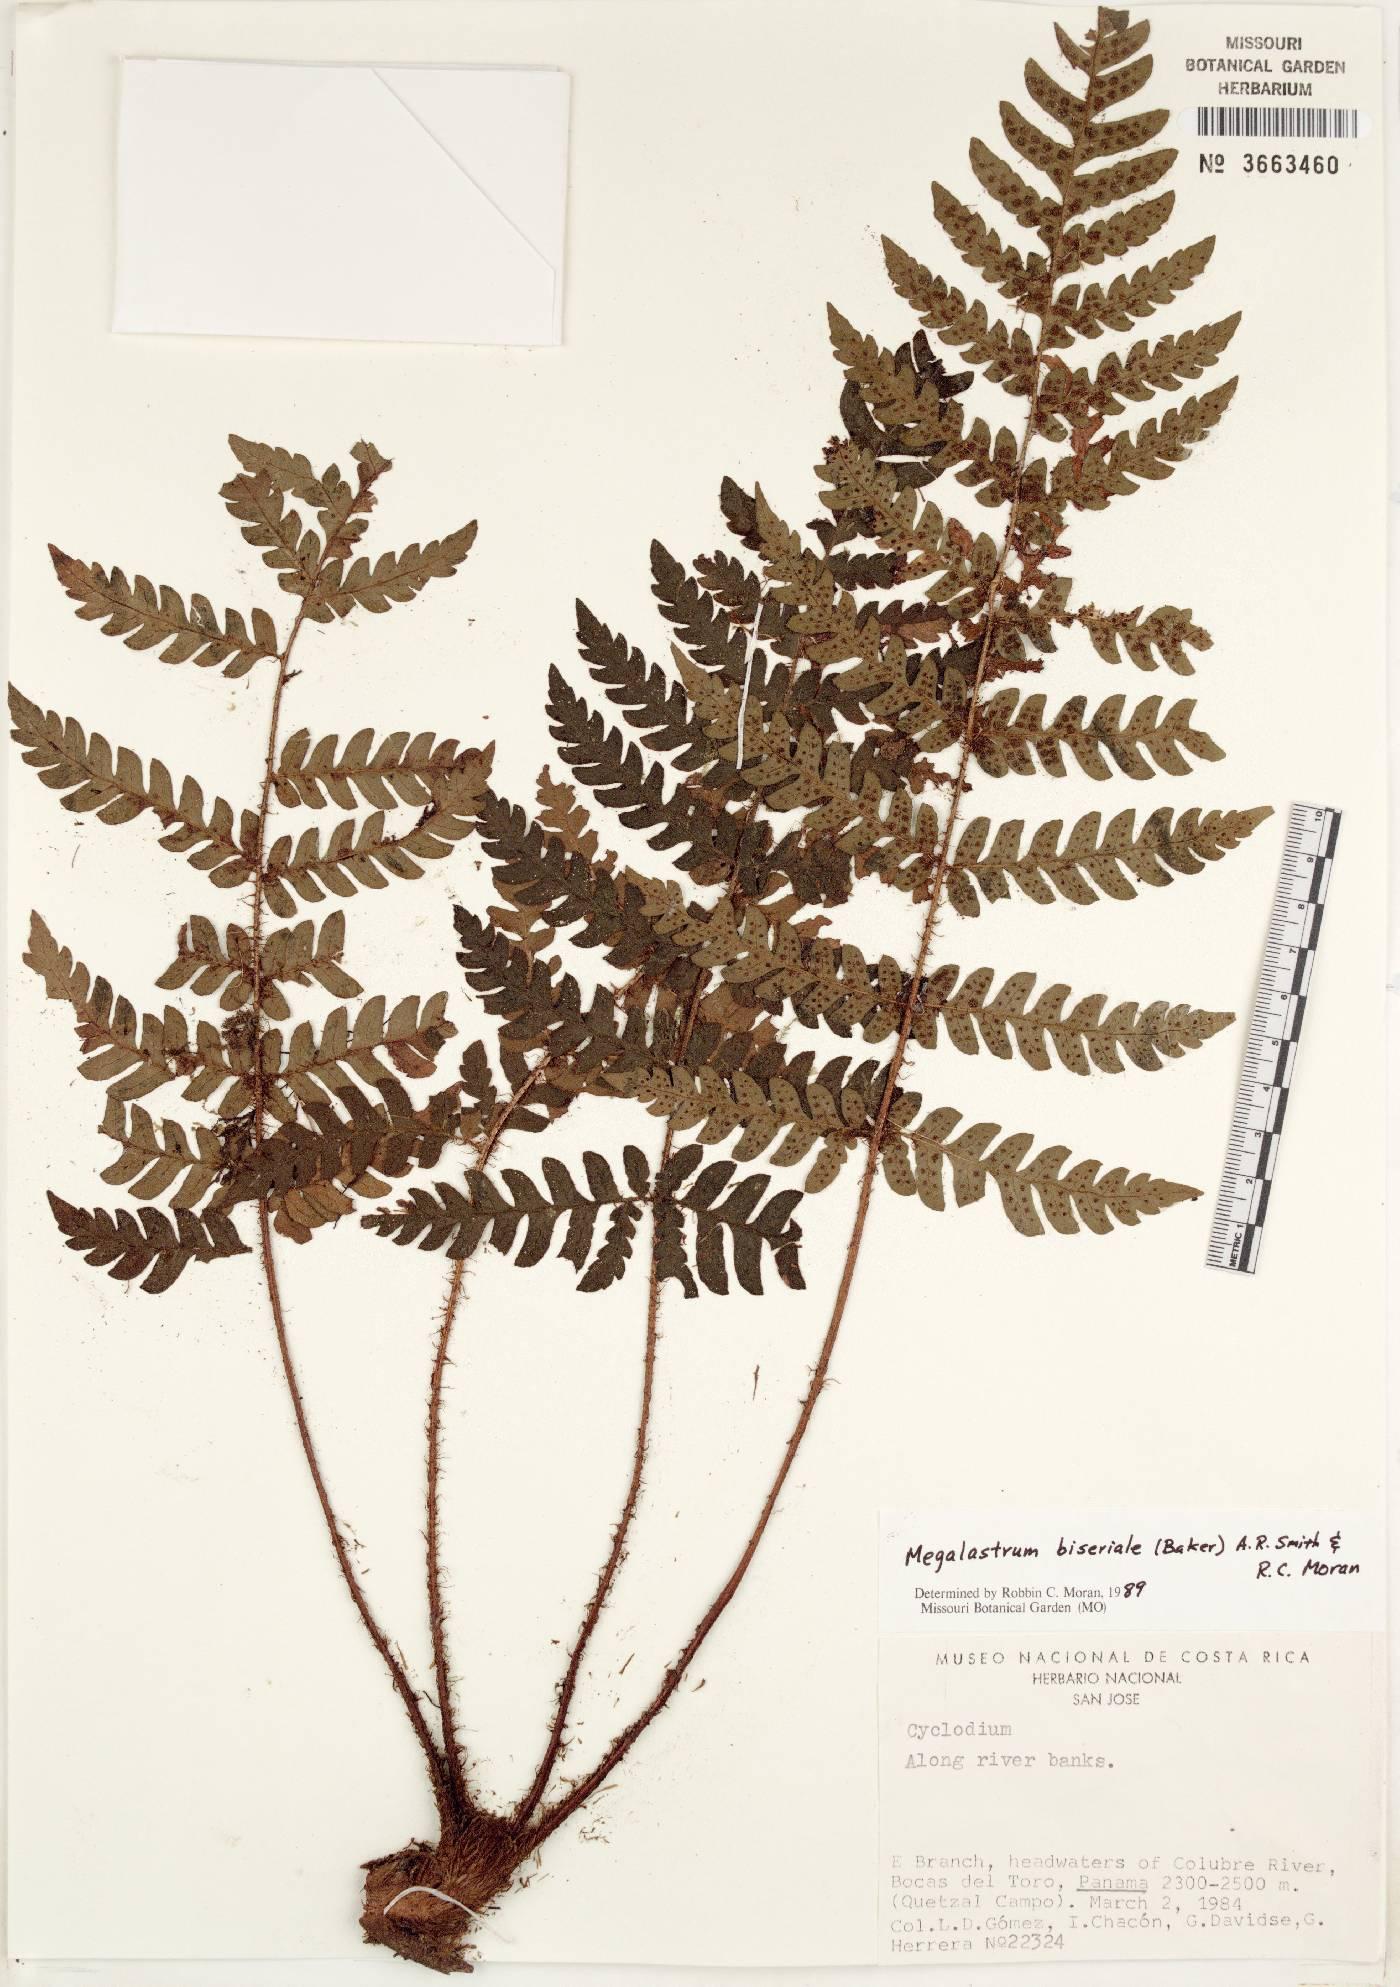 Megalastrum biseriale image